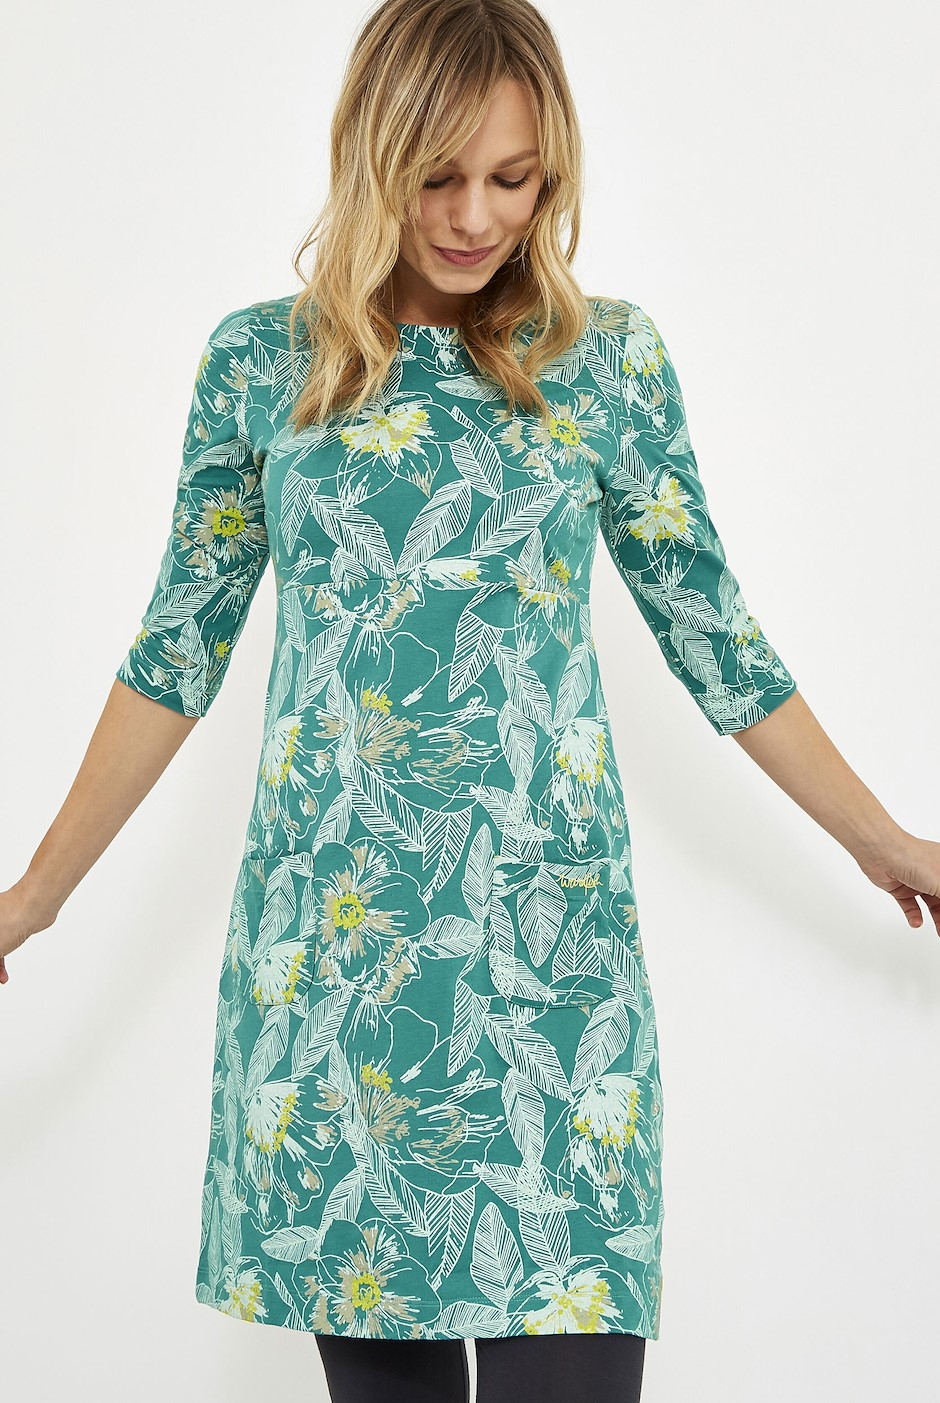 Starshine Printed Jersey Dress Viridis